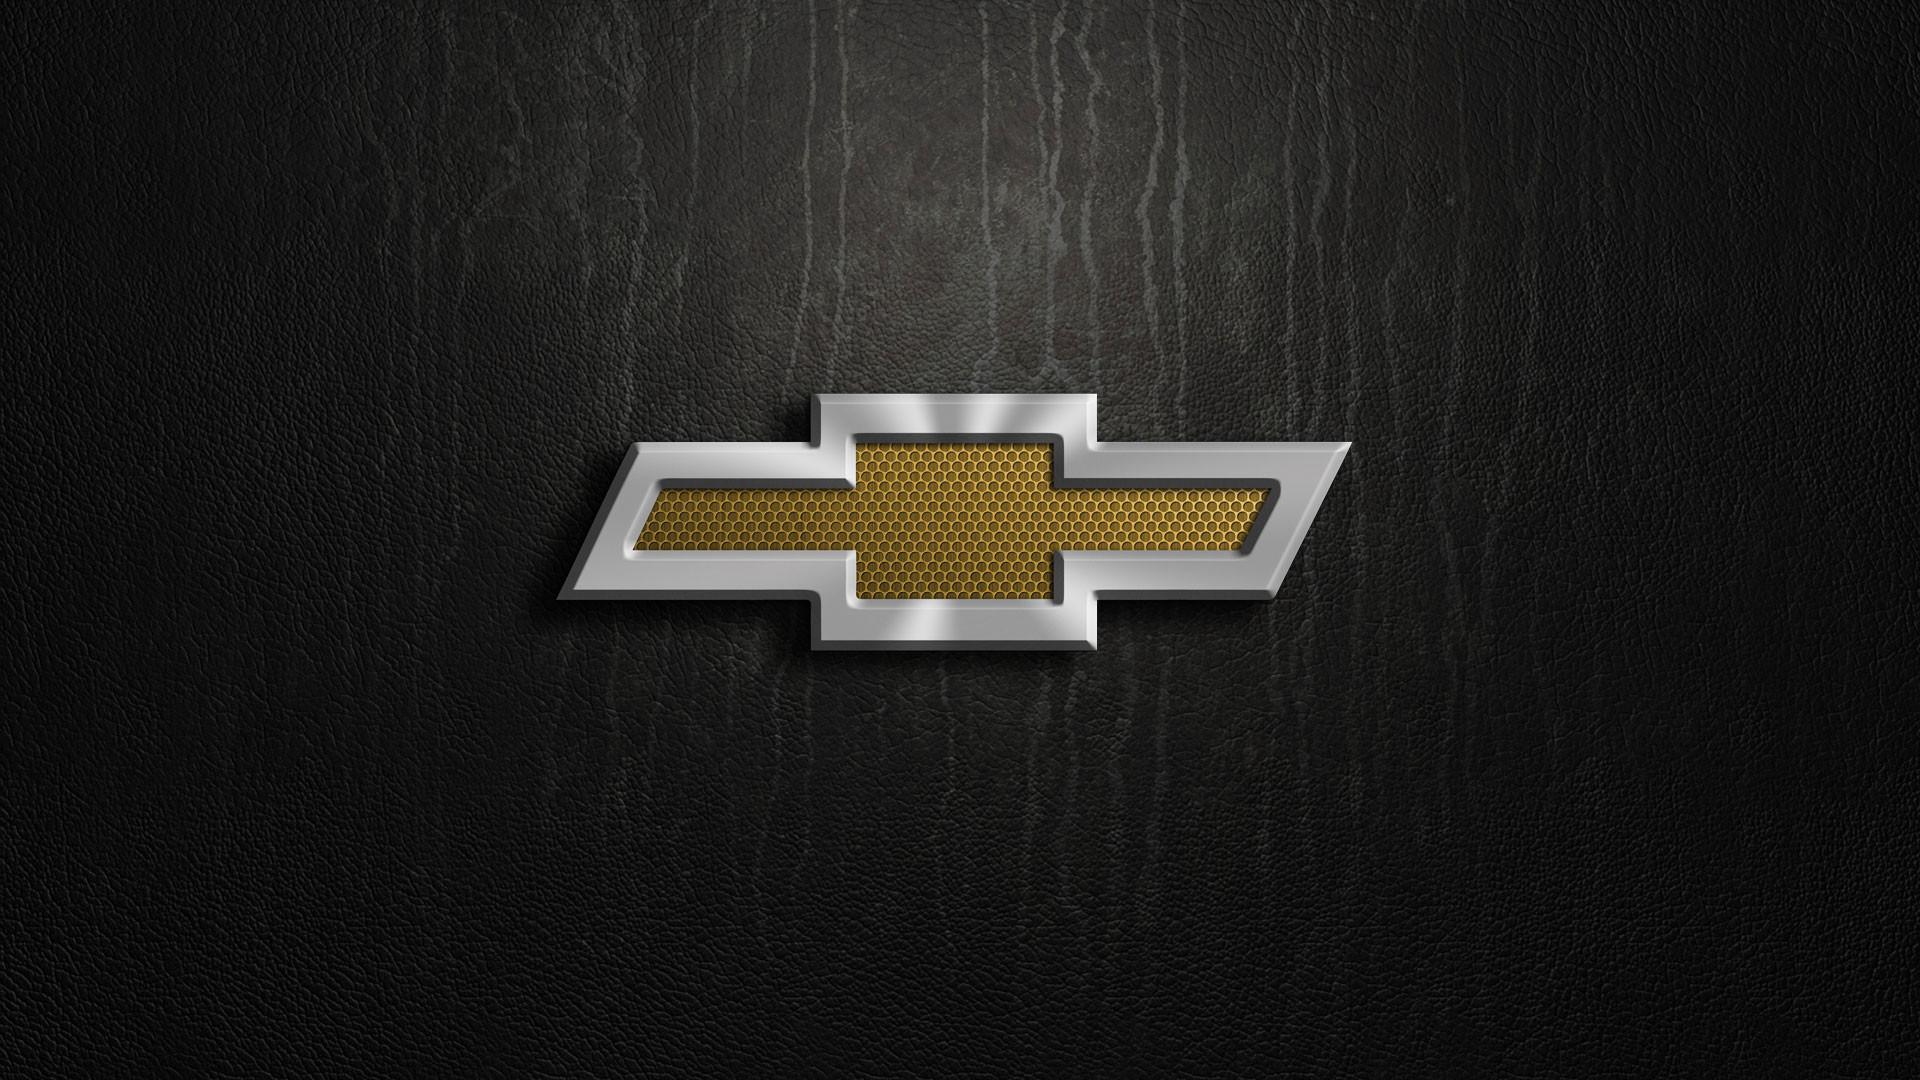 Chevy Logo Wallpaper HD-6